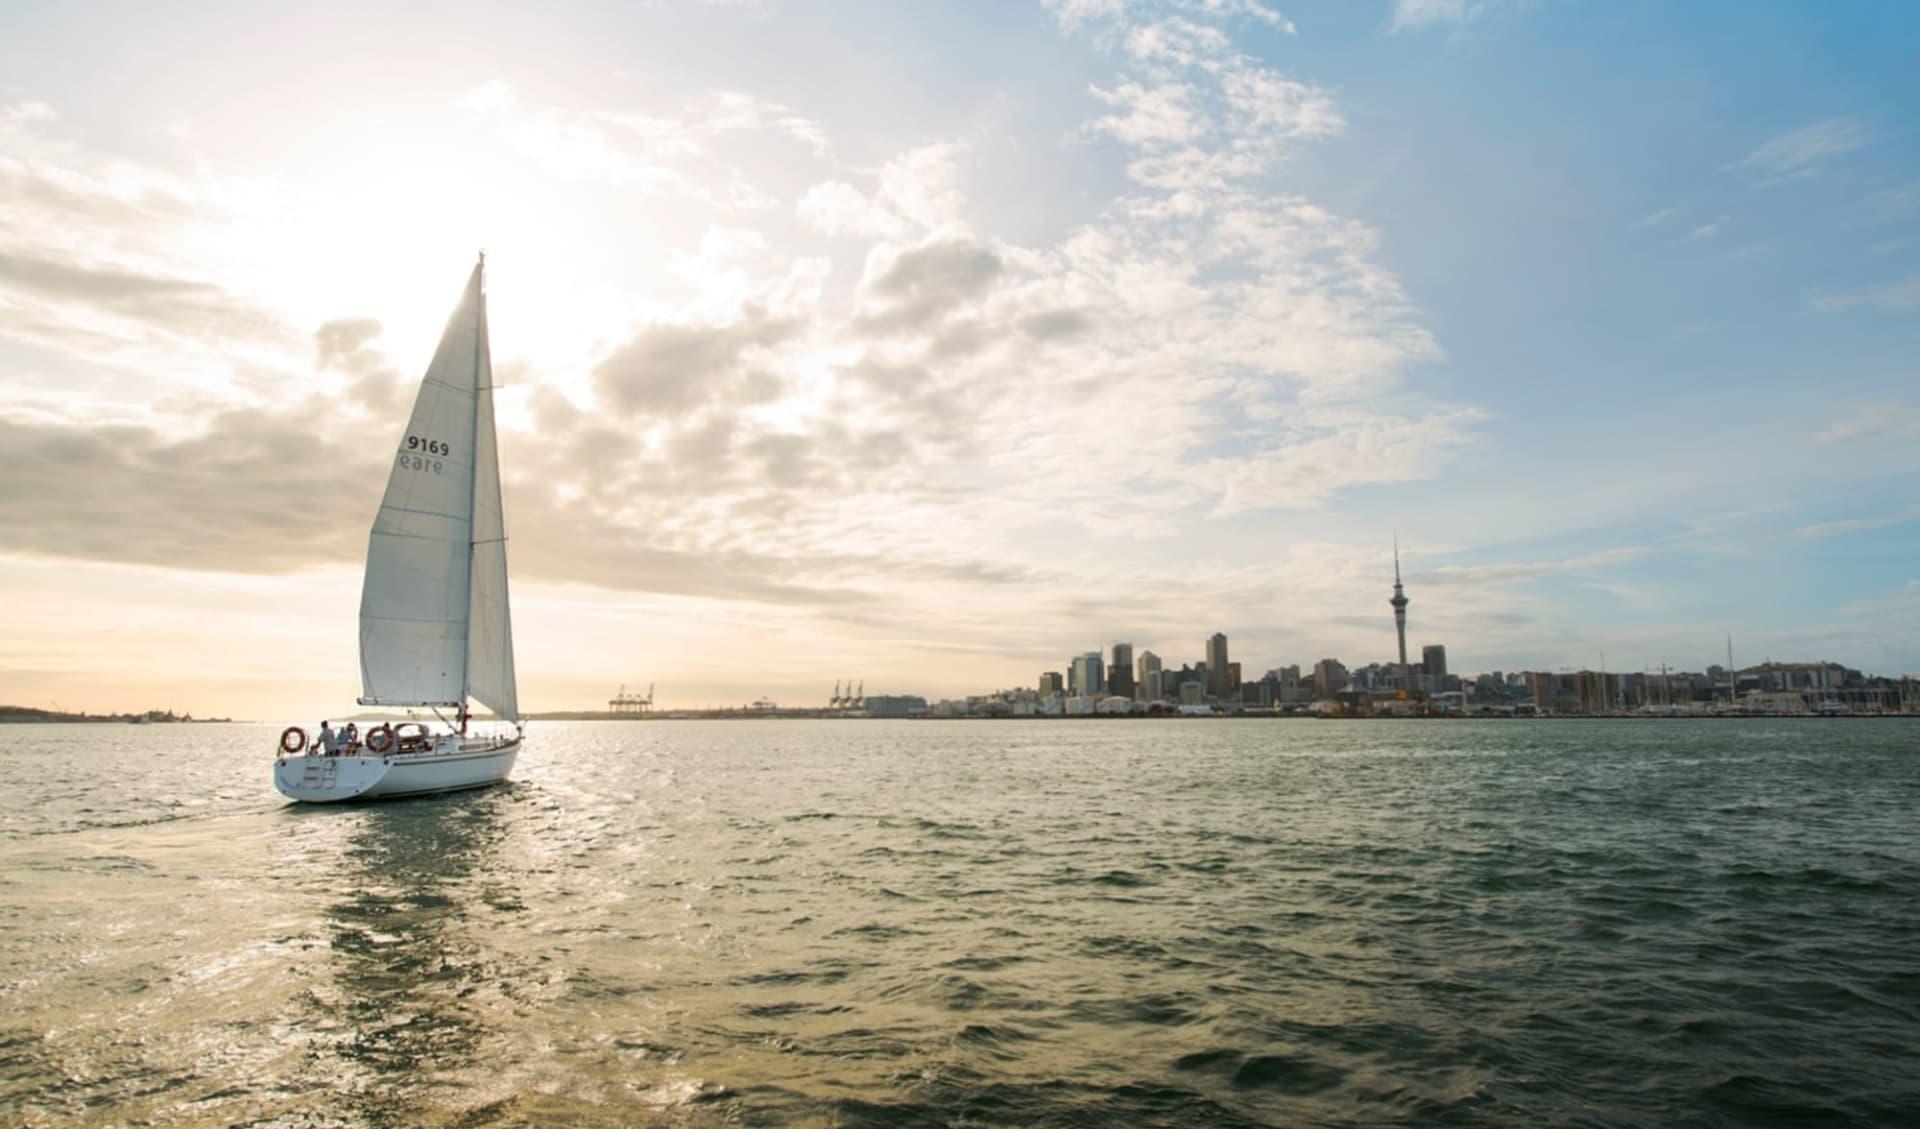 Neuseeland entdecken (Wellington - Auckland) (AAT Kings): Auckland - Segelboot vor Auckland/ Copyright Tourism New Zealand - Photographer Julian-Apse